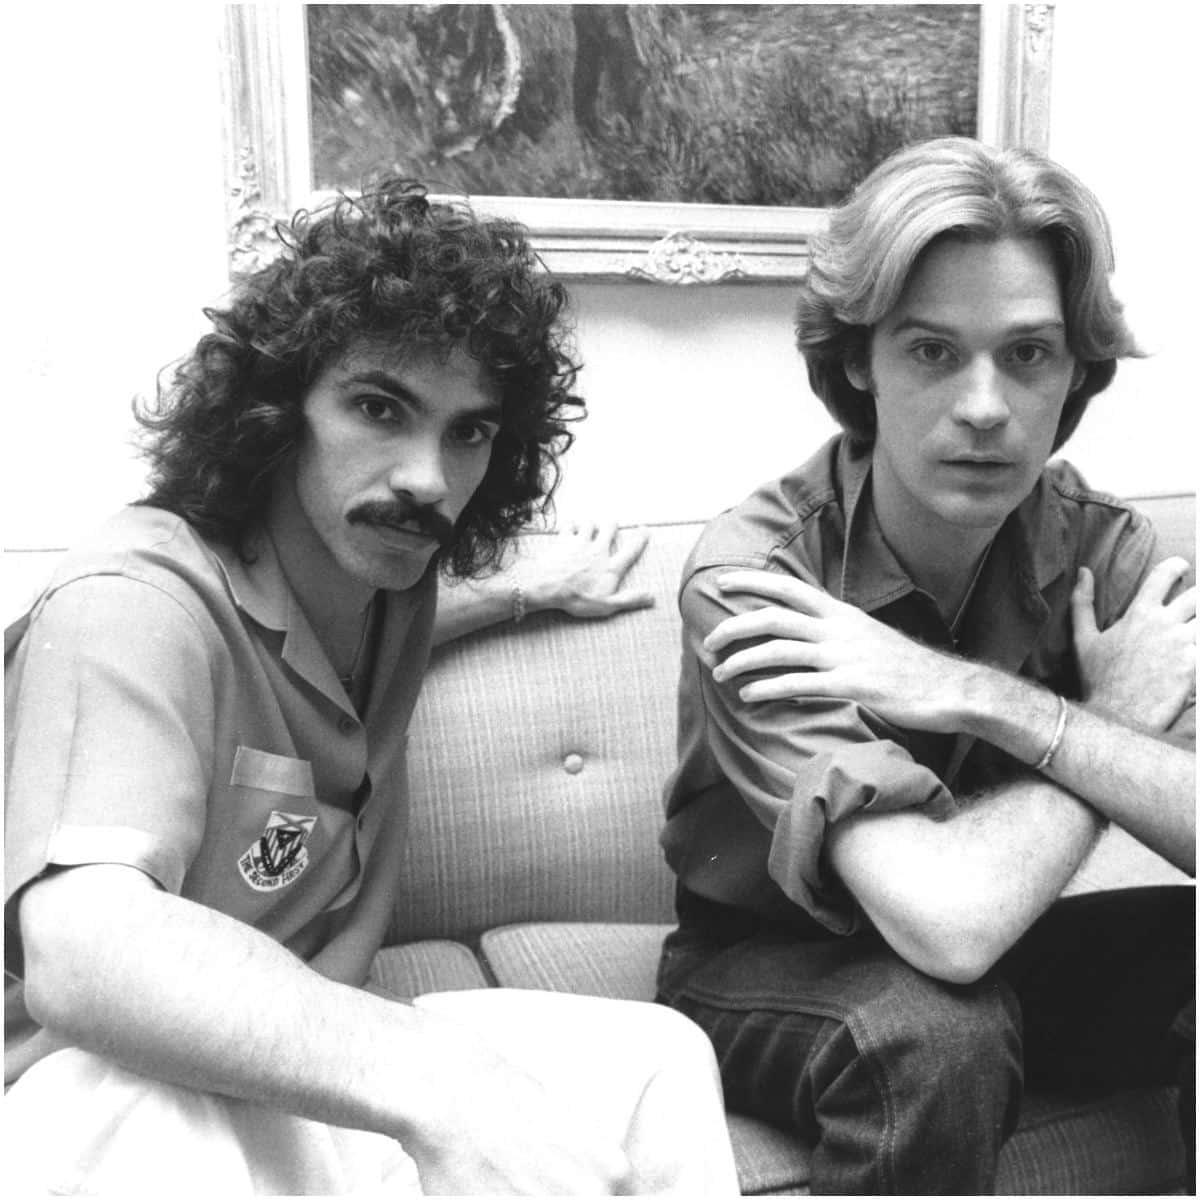 Daryl Hall with John Oates